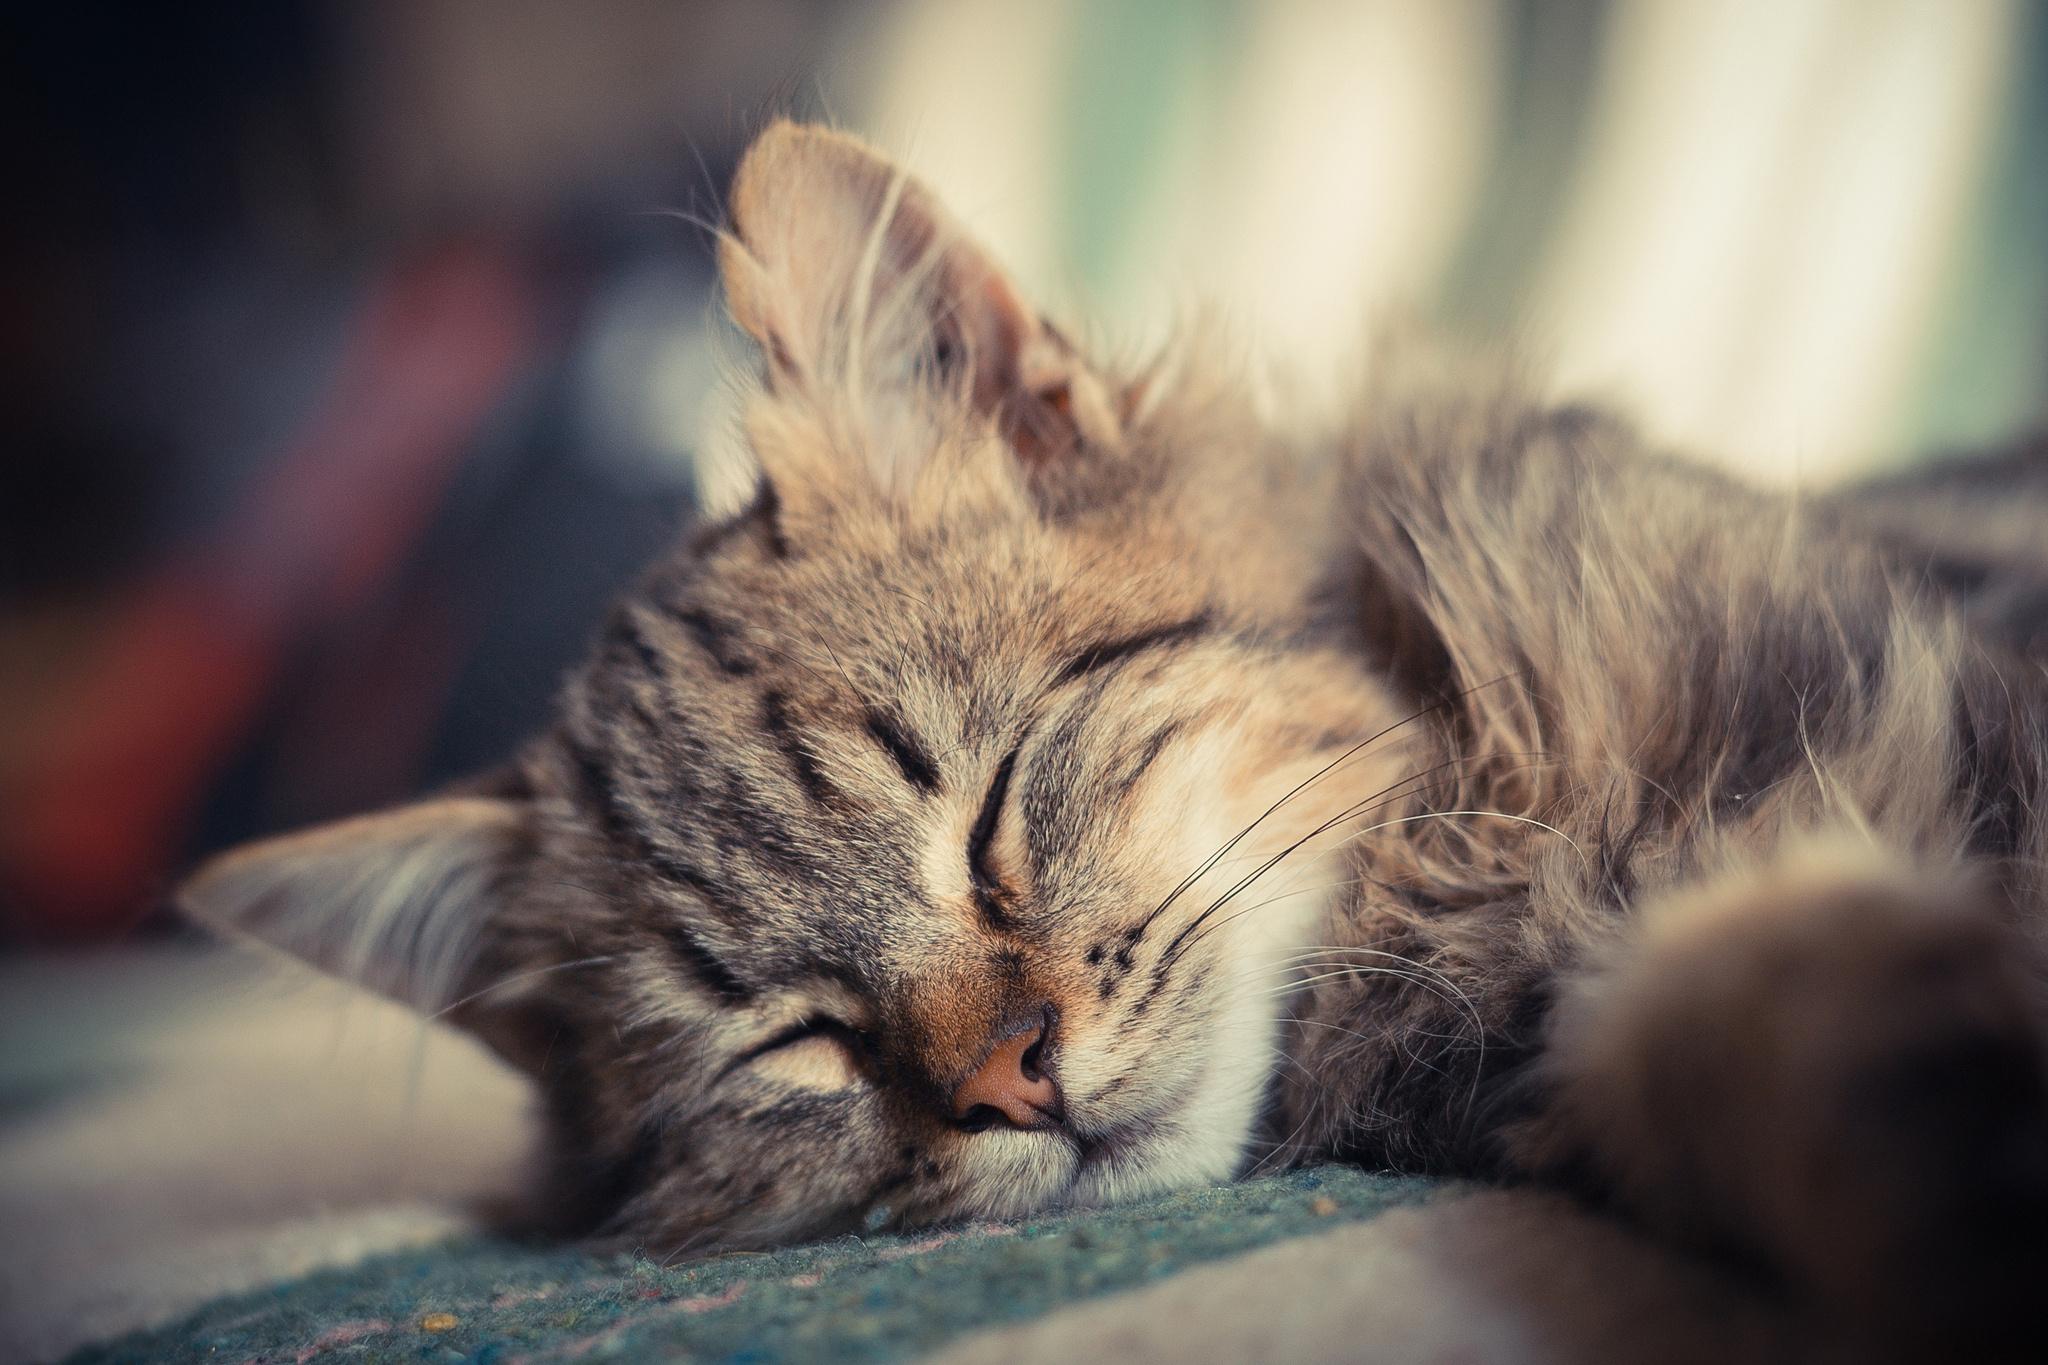 cute cats sleep wallpaper - photo #20